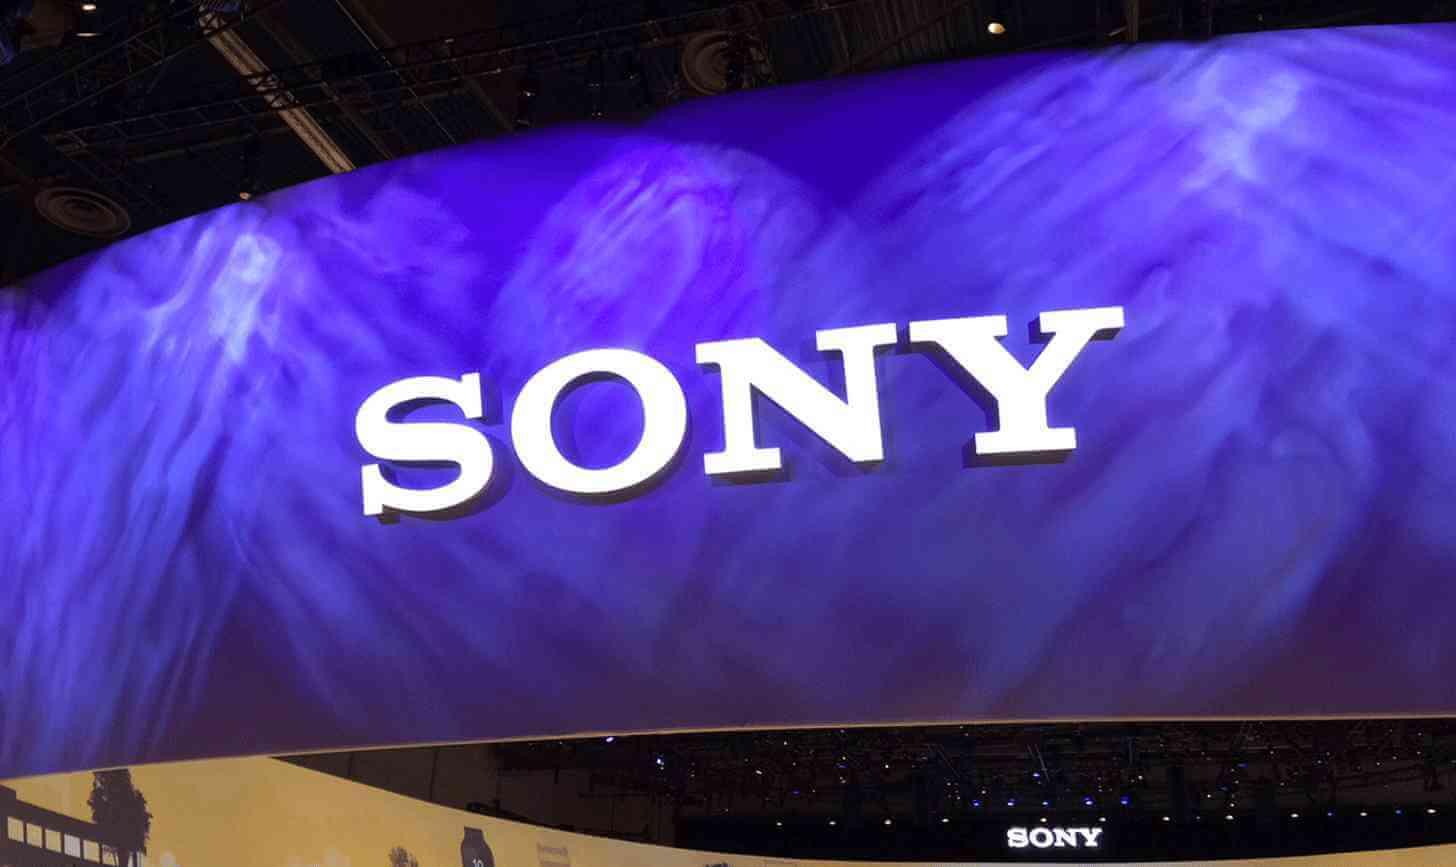 smt mwc2016 p2 - Sony apresenta nova linha Xperia X na MWC 2016